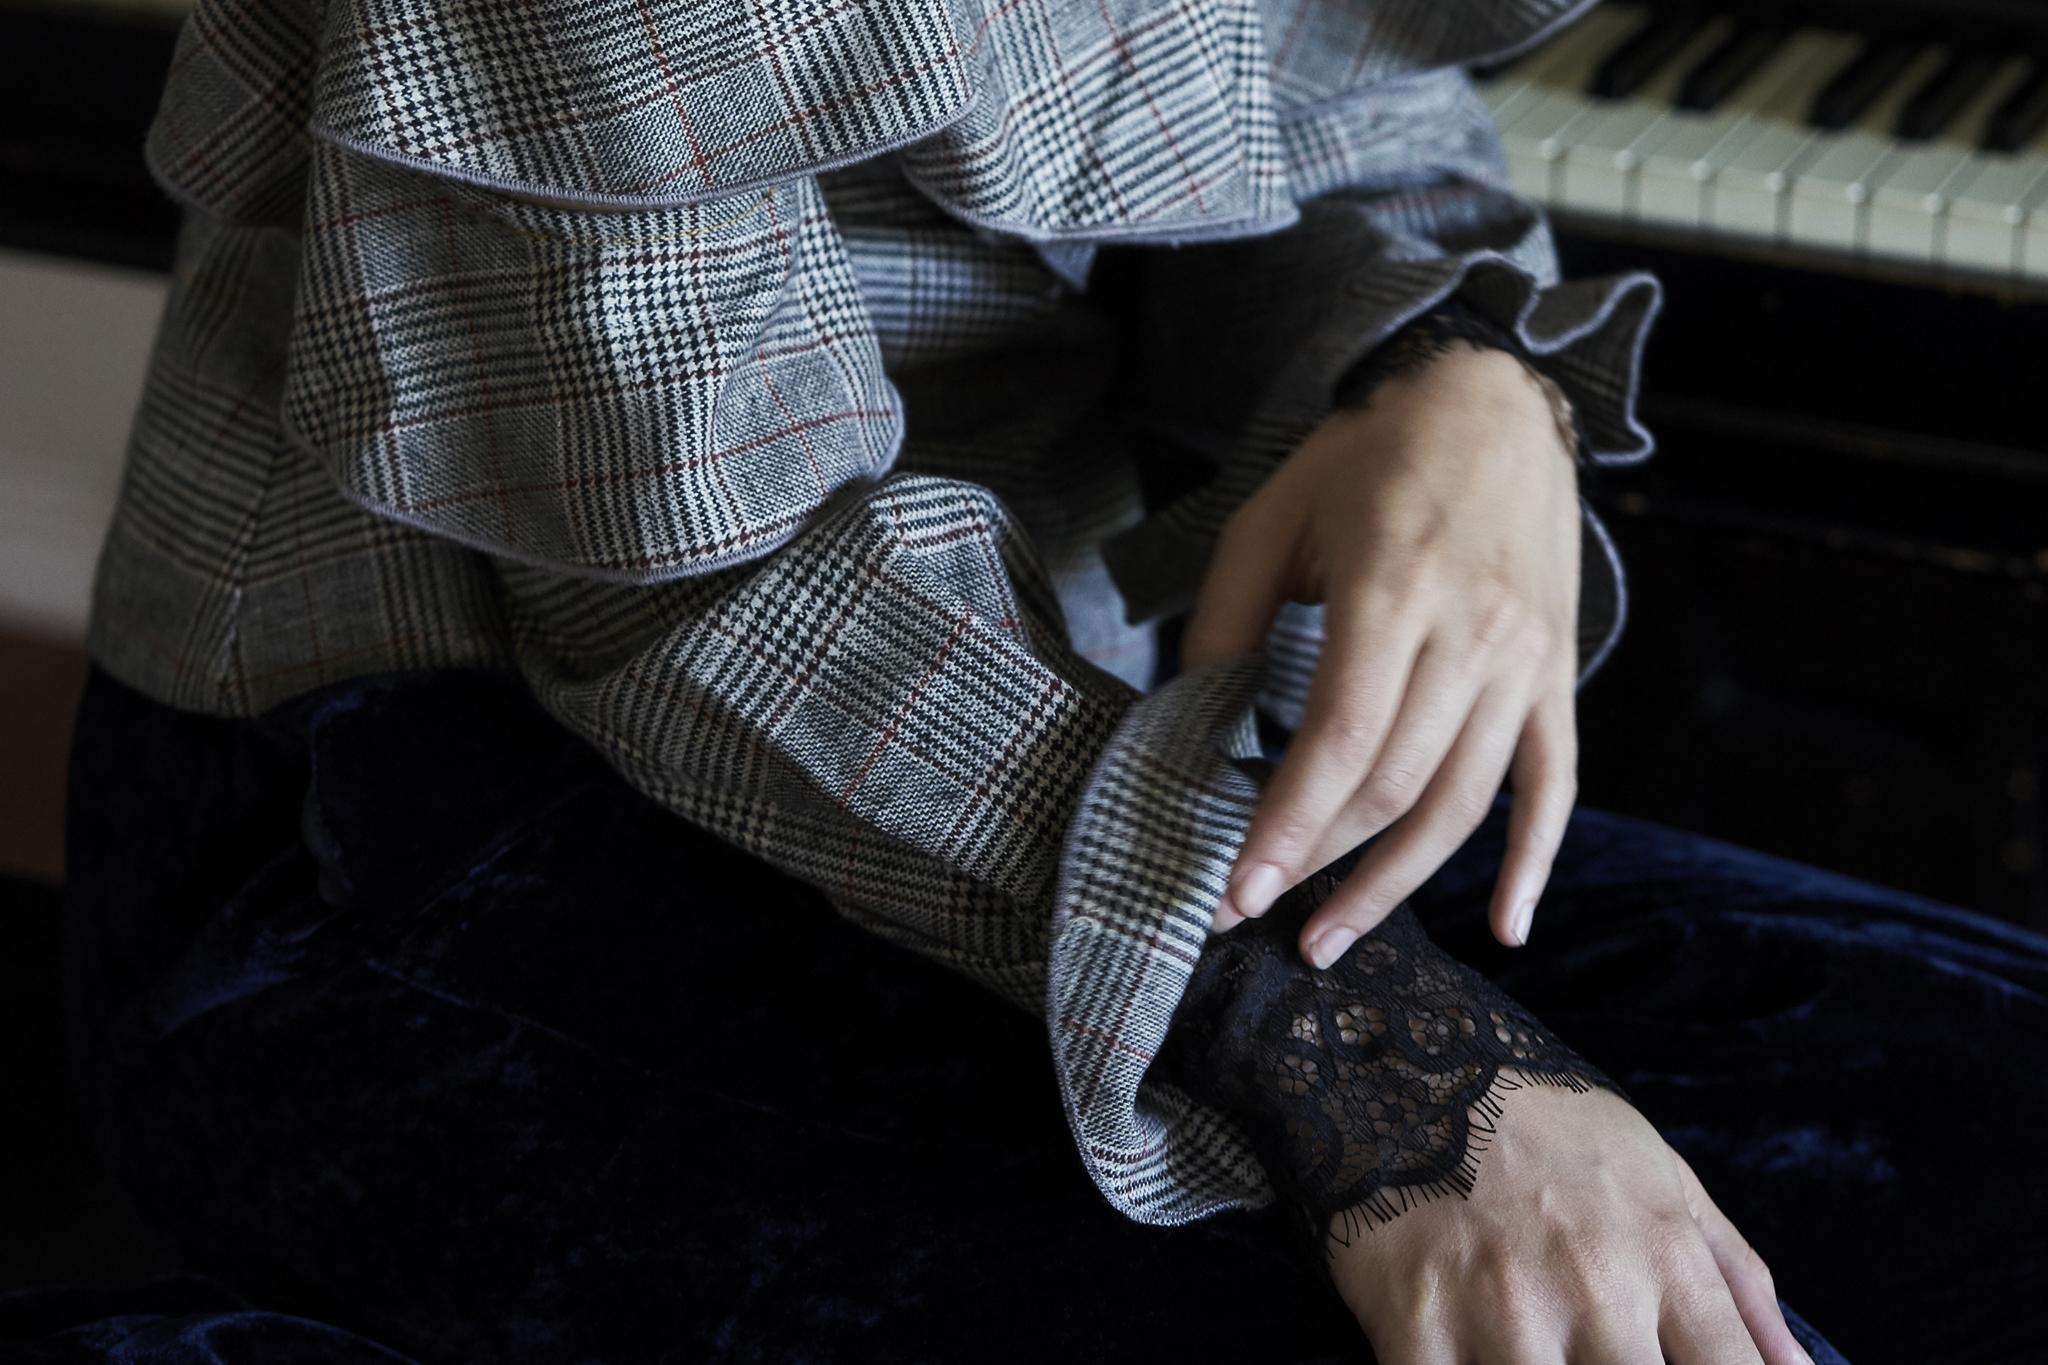 Top—Self Portrait / Elizabeth Charles, Pants—Nili Lotan / Elizabeth Charles